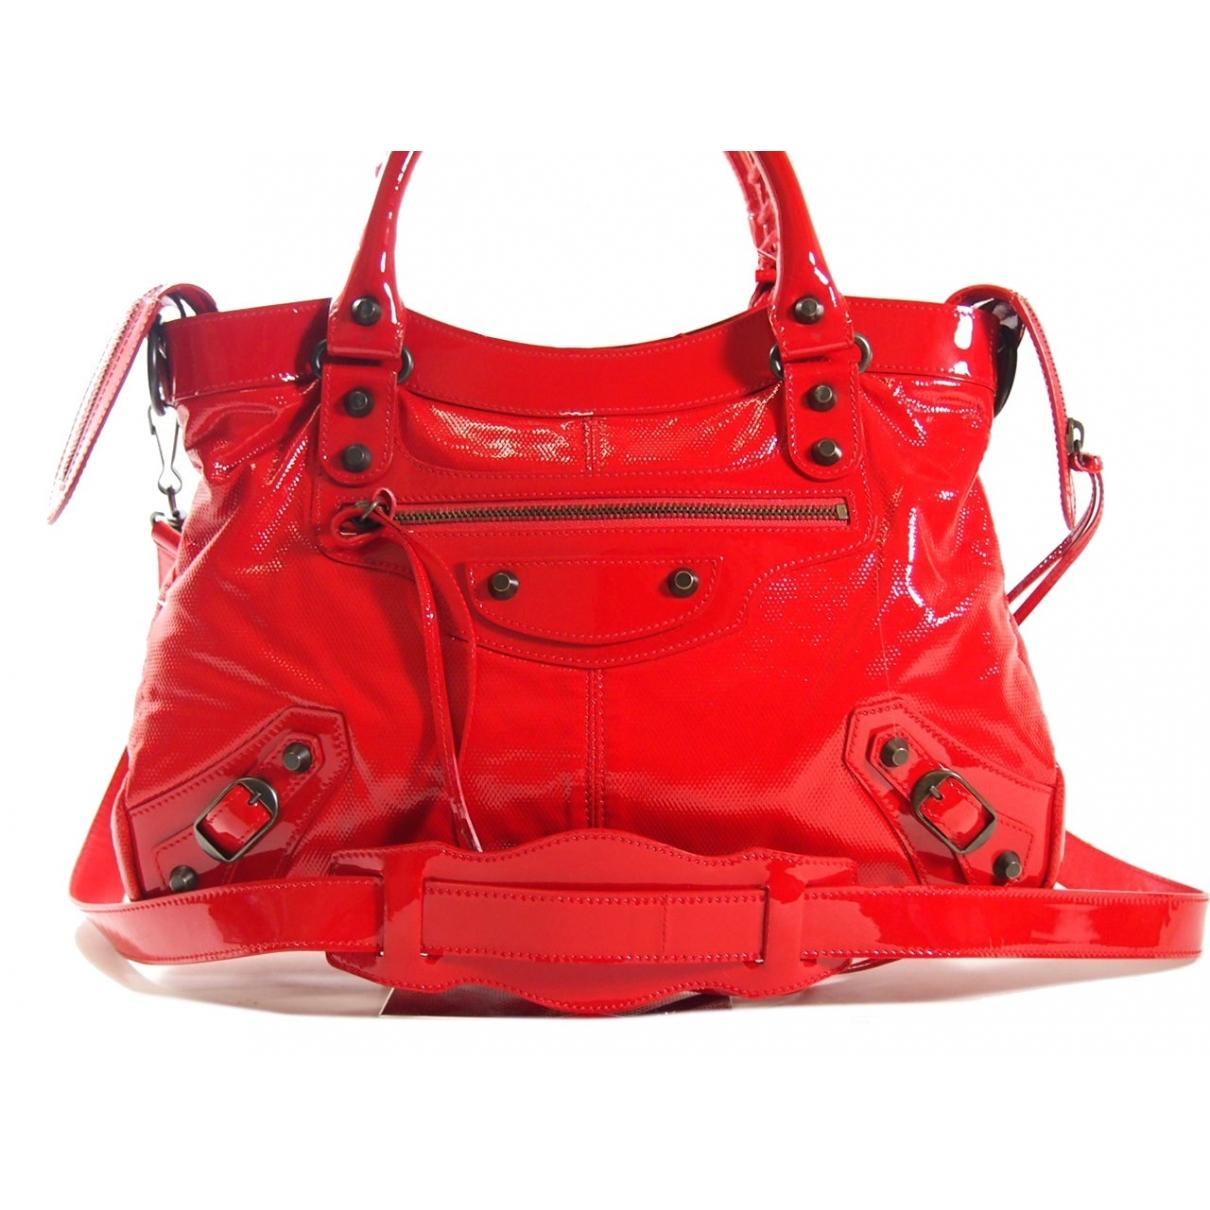 Balenciaga - Sac a main Velo pour femme en cuir verni - rouge